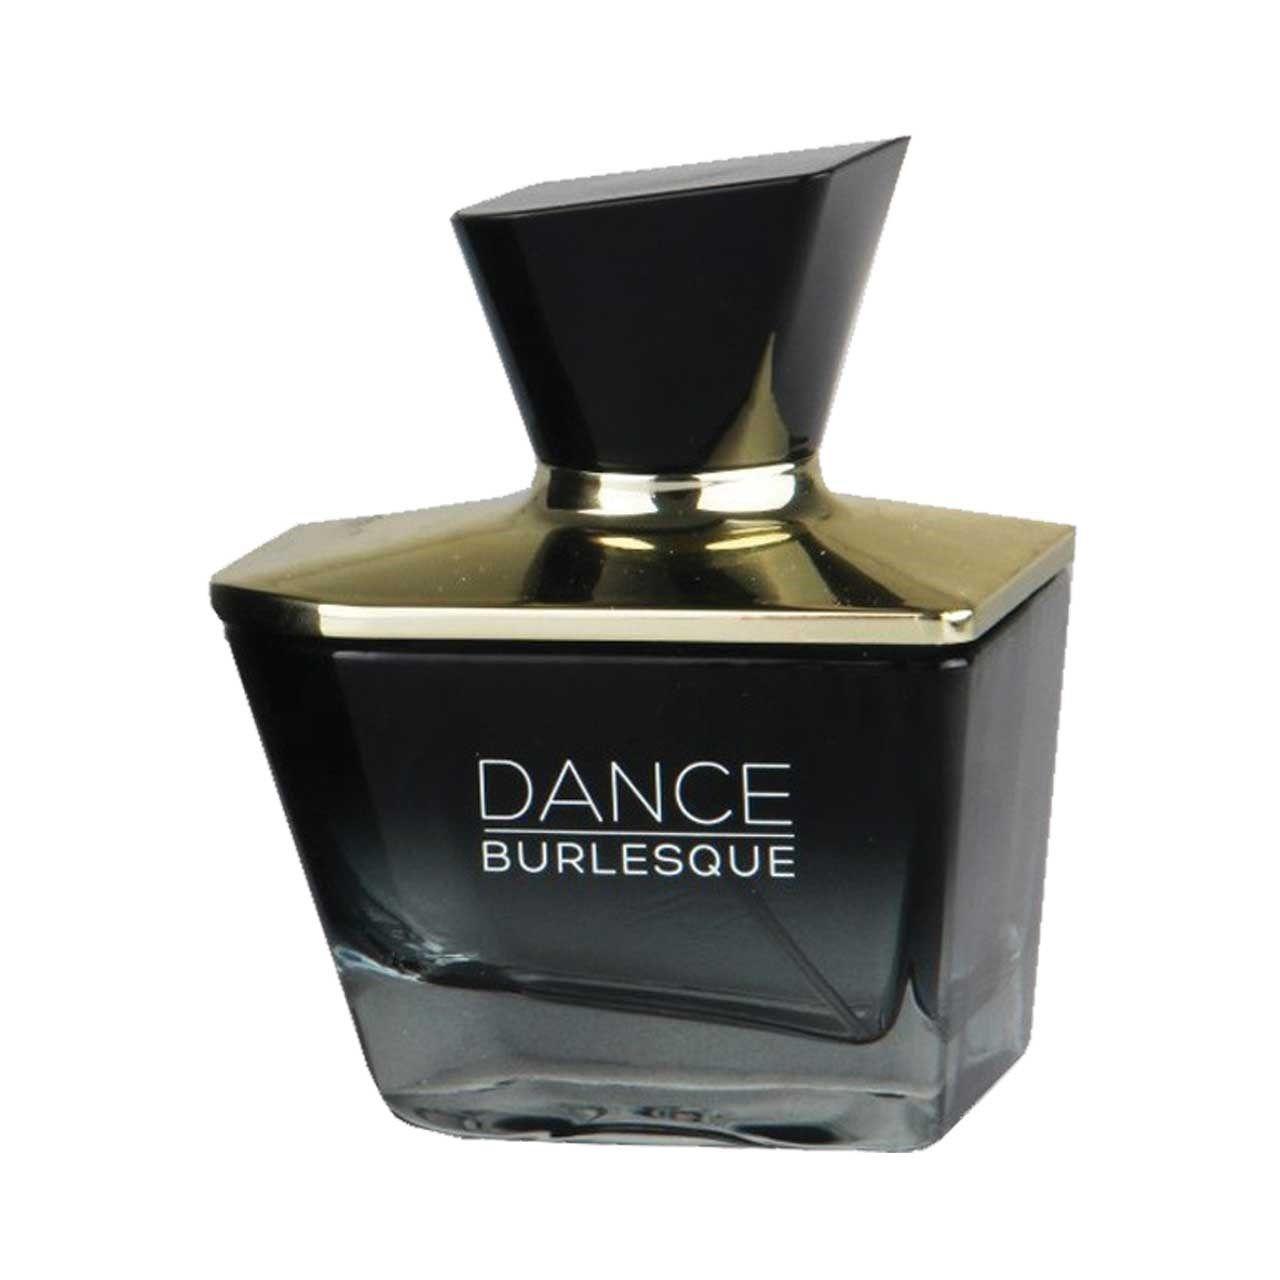 ادوپرفیوم زنانه لین یانگ مدل Dance Burlesque حجم 100 میلی لیتر -  - 1